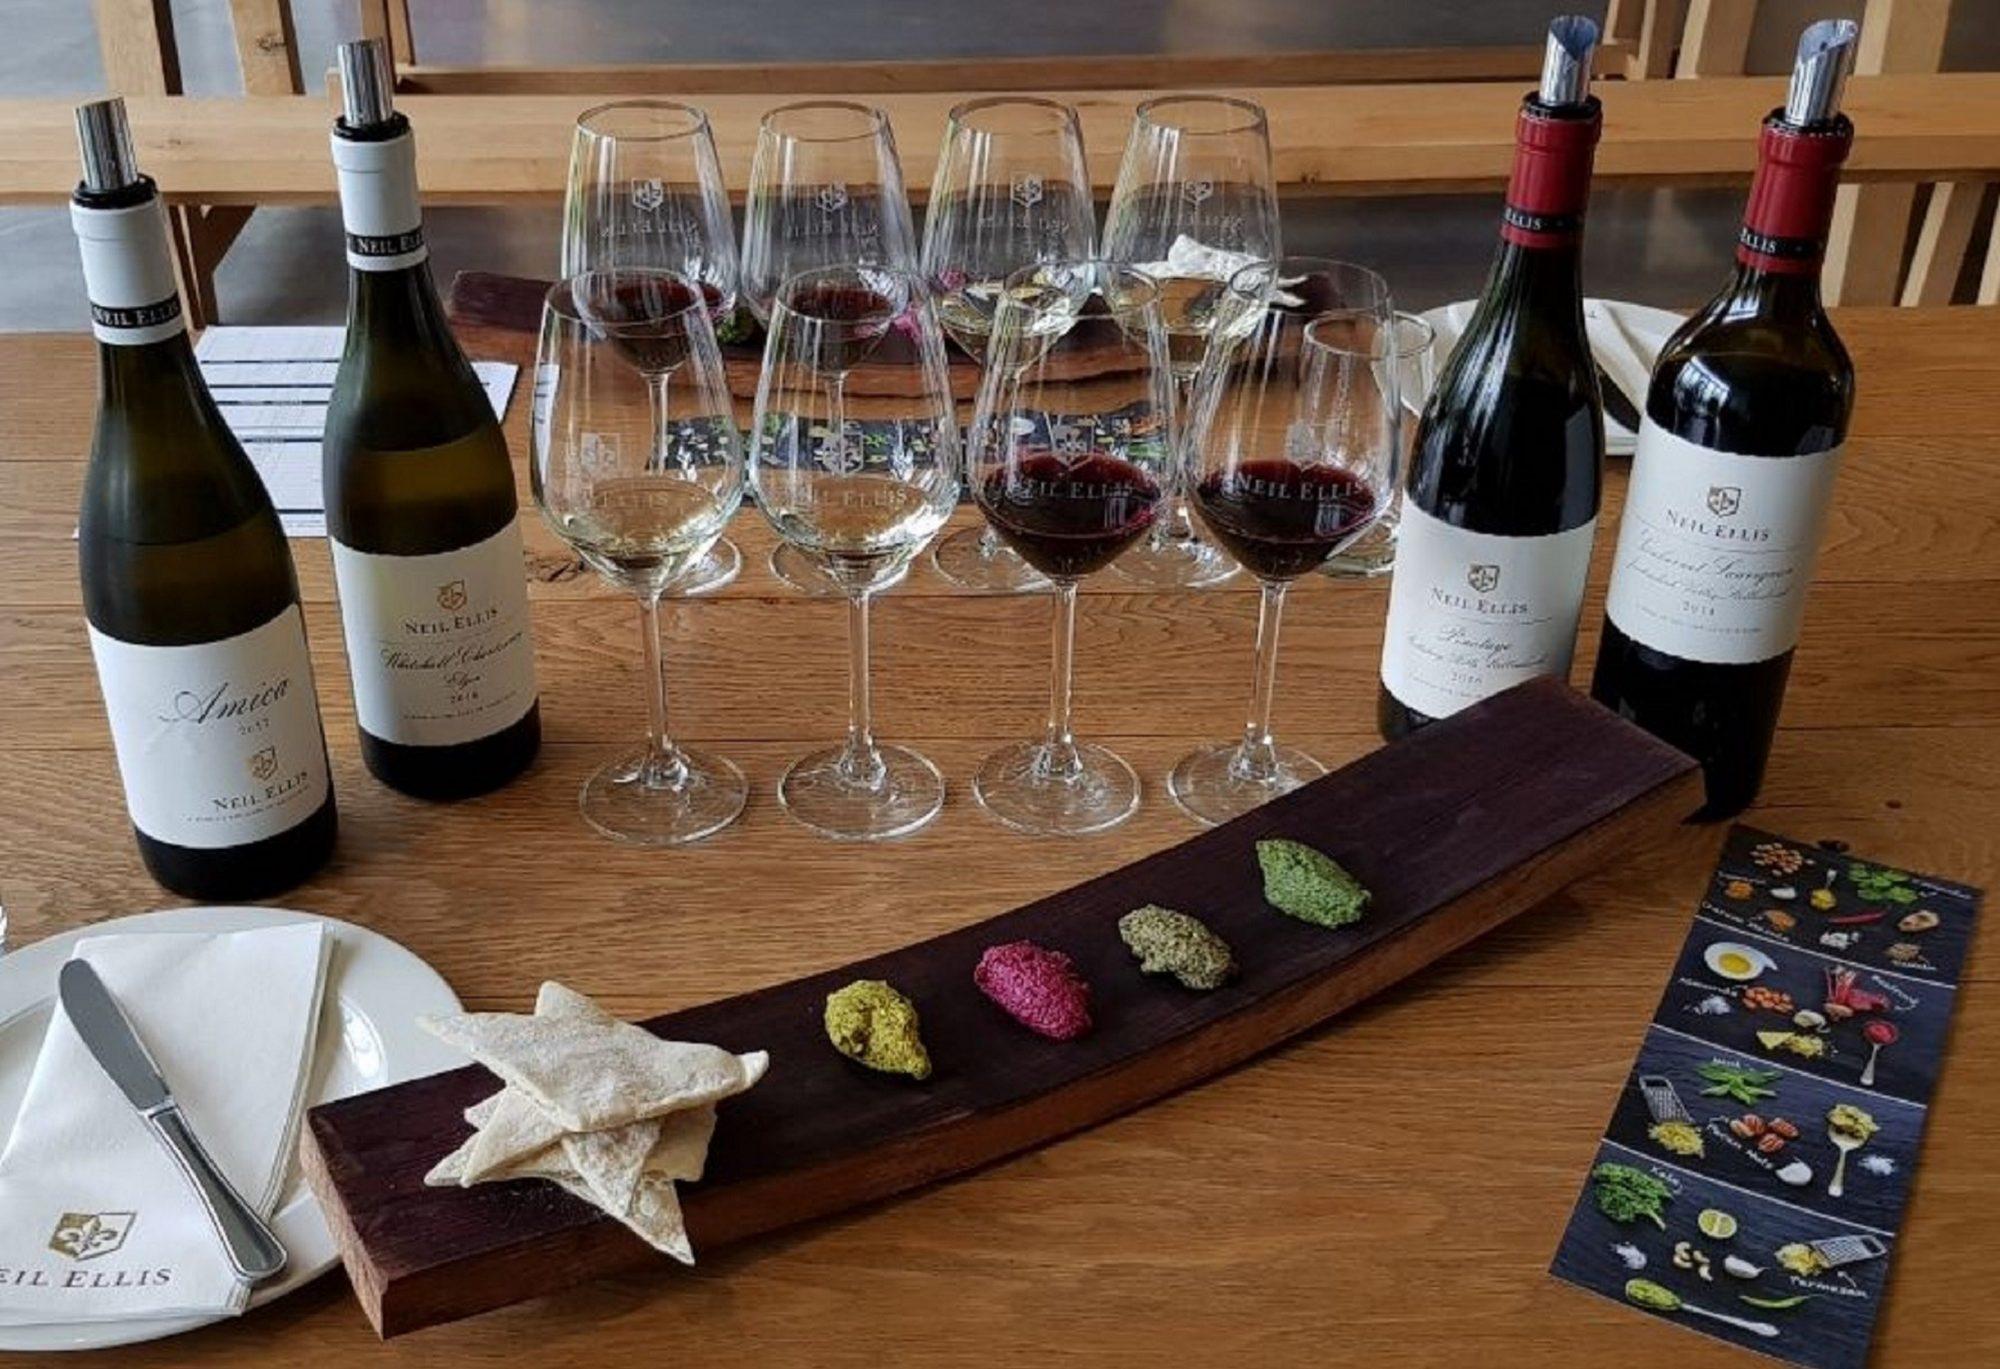 "{NEWS} ""Pesto & wine play"" at Neil Ellis this summer"